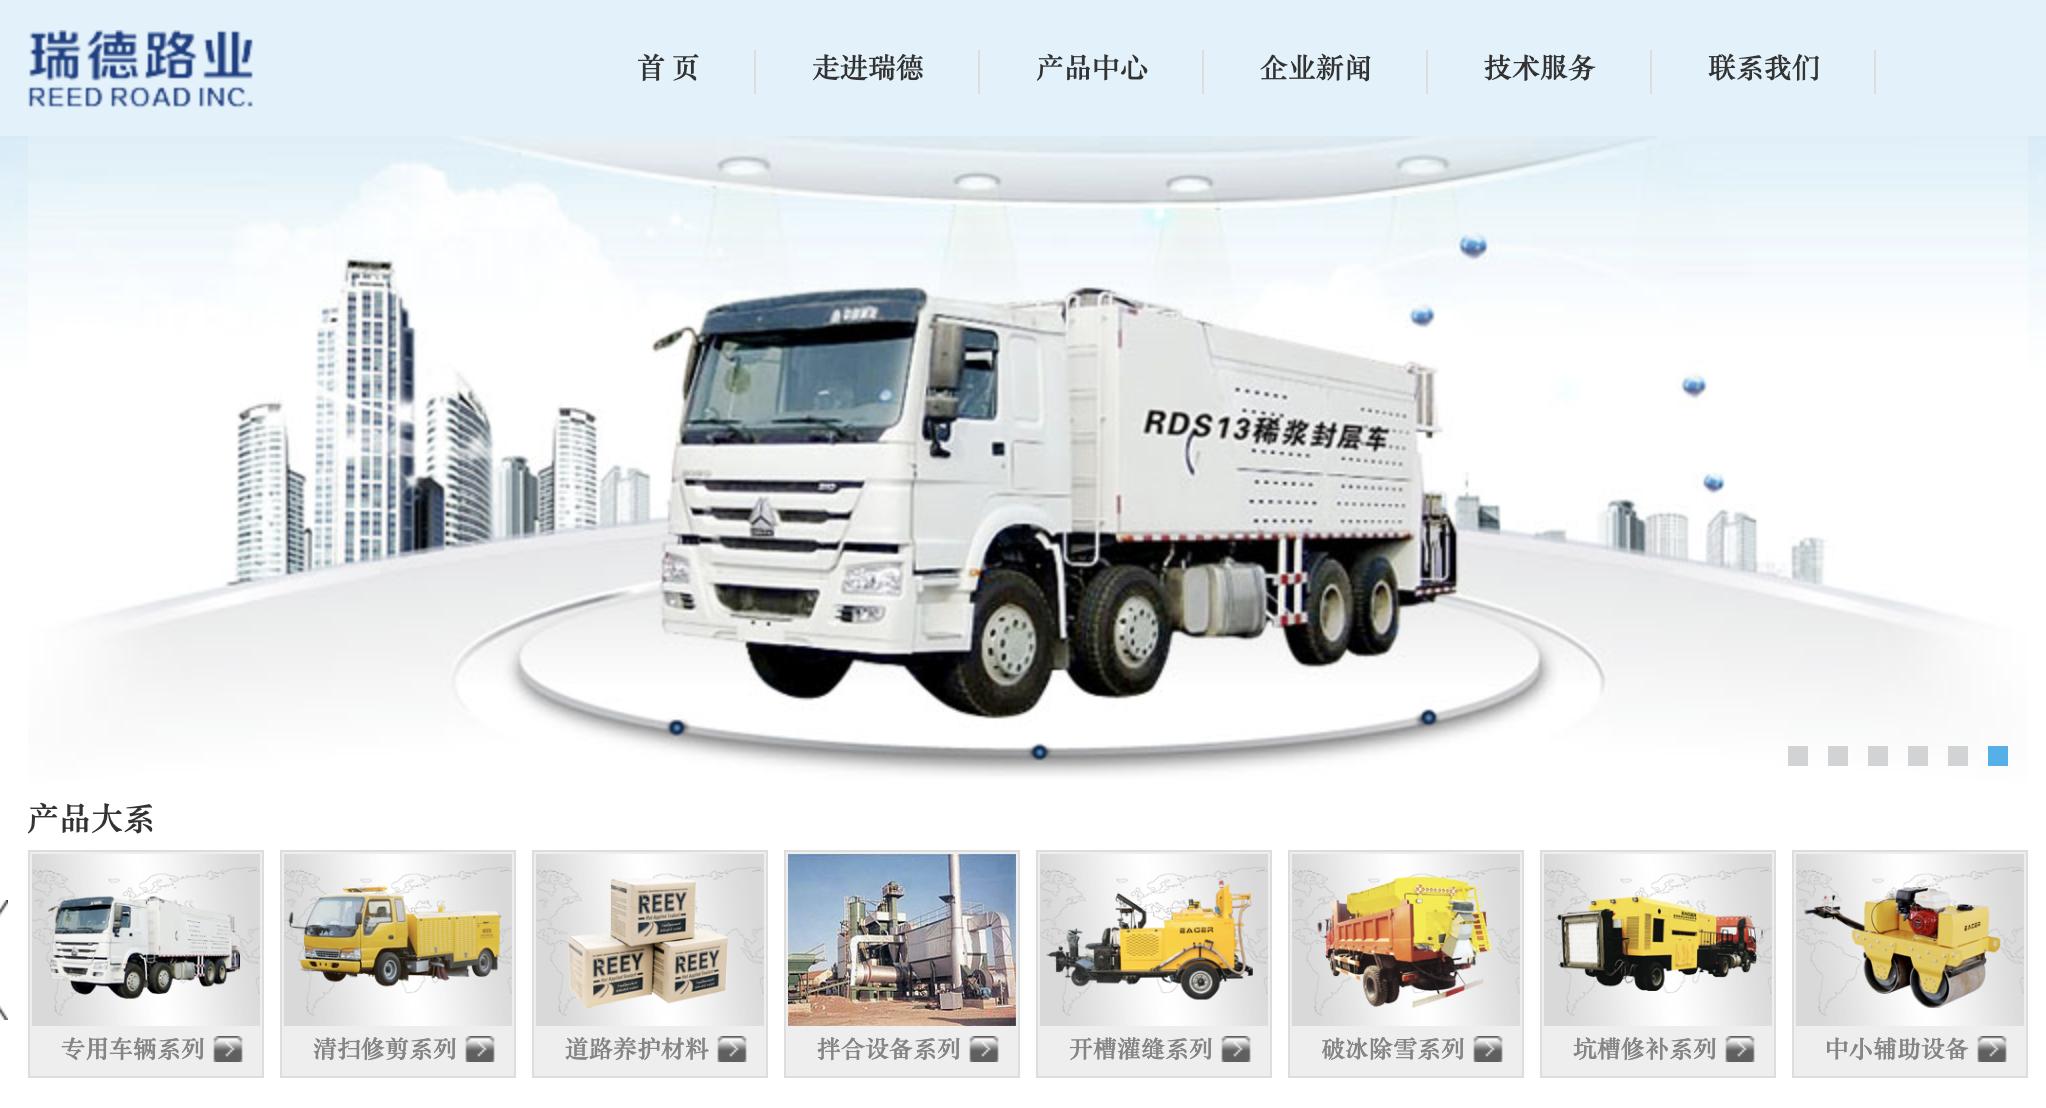 REED, Chinese Road Maintenance Provider, Seeks $10 Million IPO